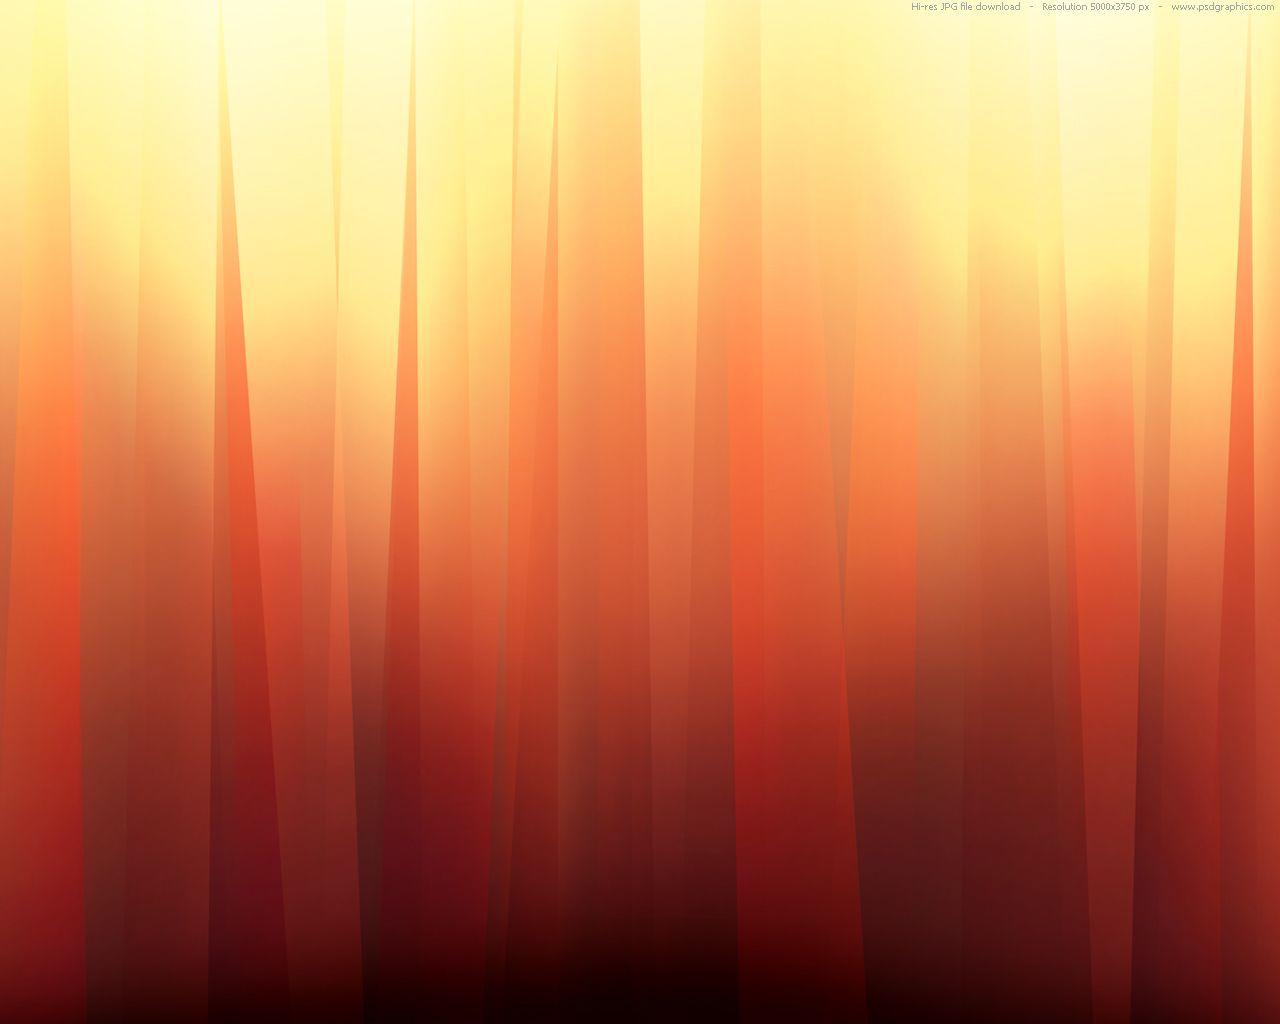 Lava texture bing images - Photoshop Background Bing Images Creative Ideasphotoshoptexture